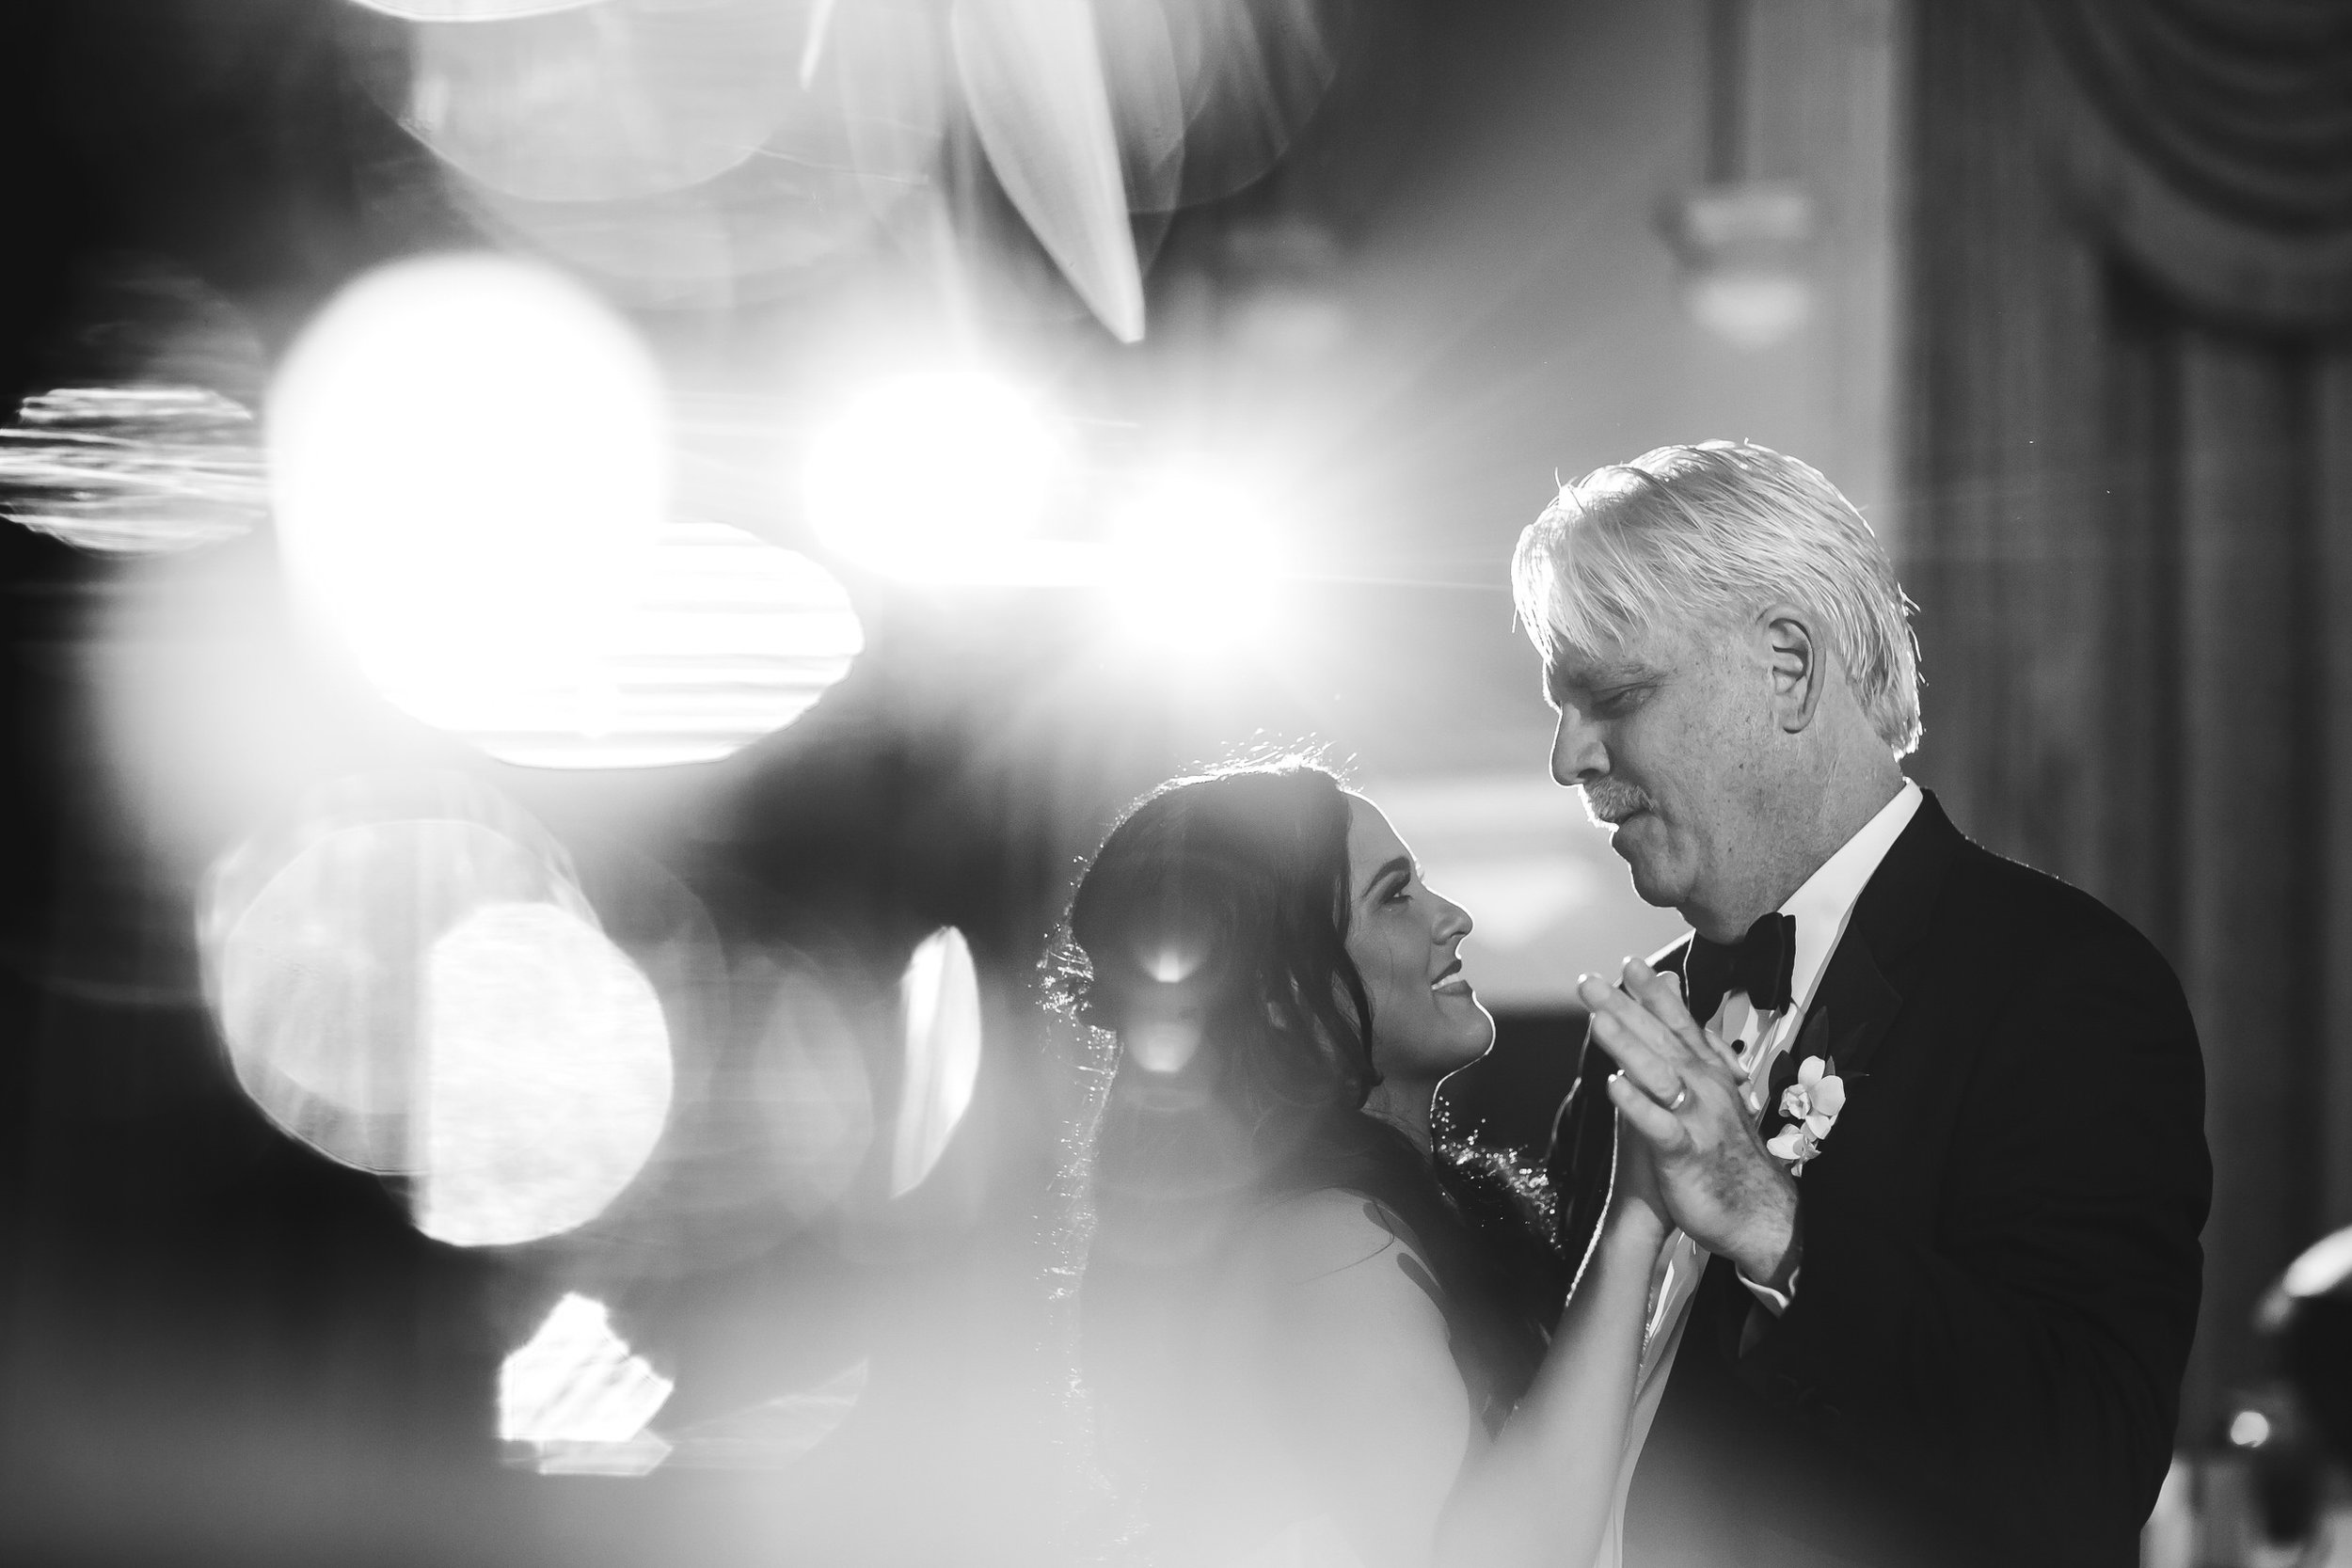 miami-biltmore-wedding-photographer-reception-party-33.jpg